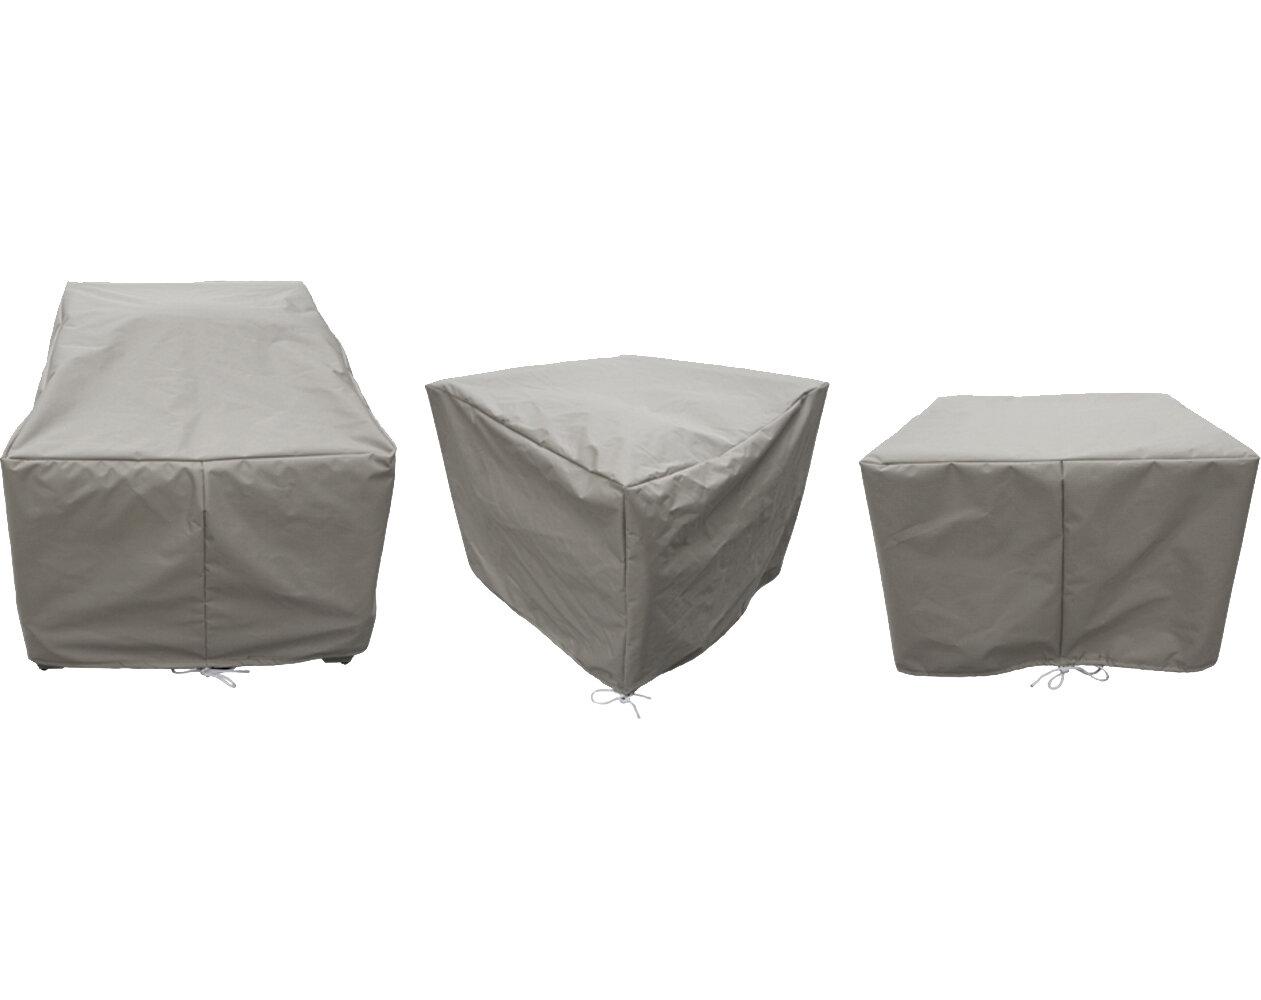 Sol 72 Outdoor Waterbury 7 Piece Water Resistant Patio Furniture Cover Set Reviews Wayfair